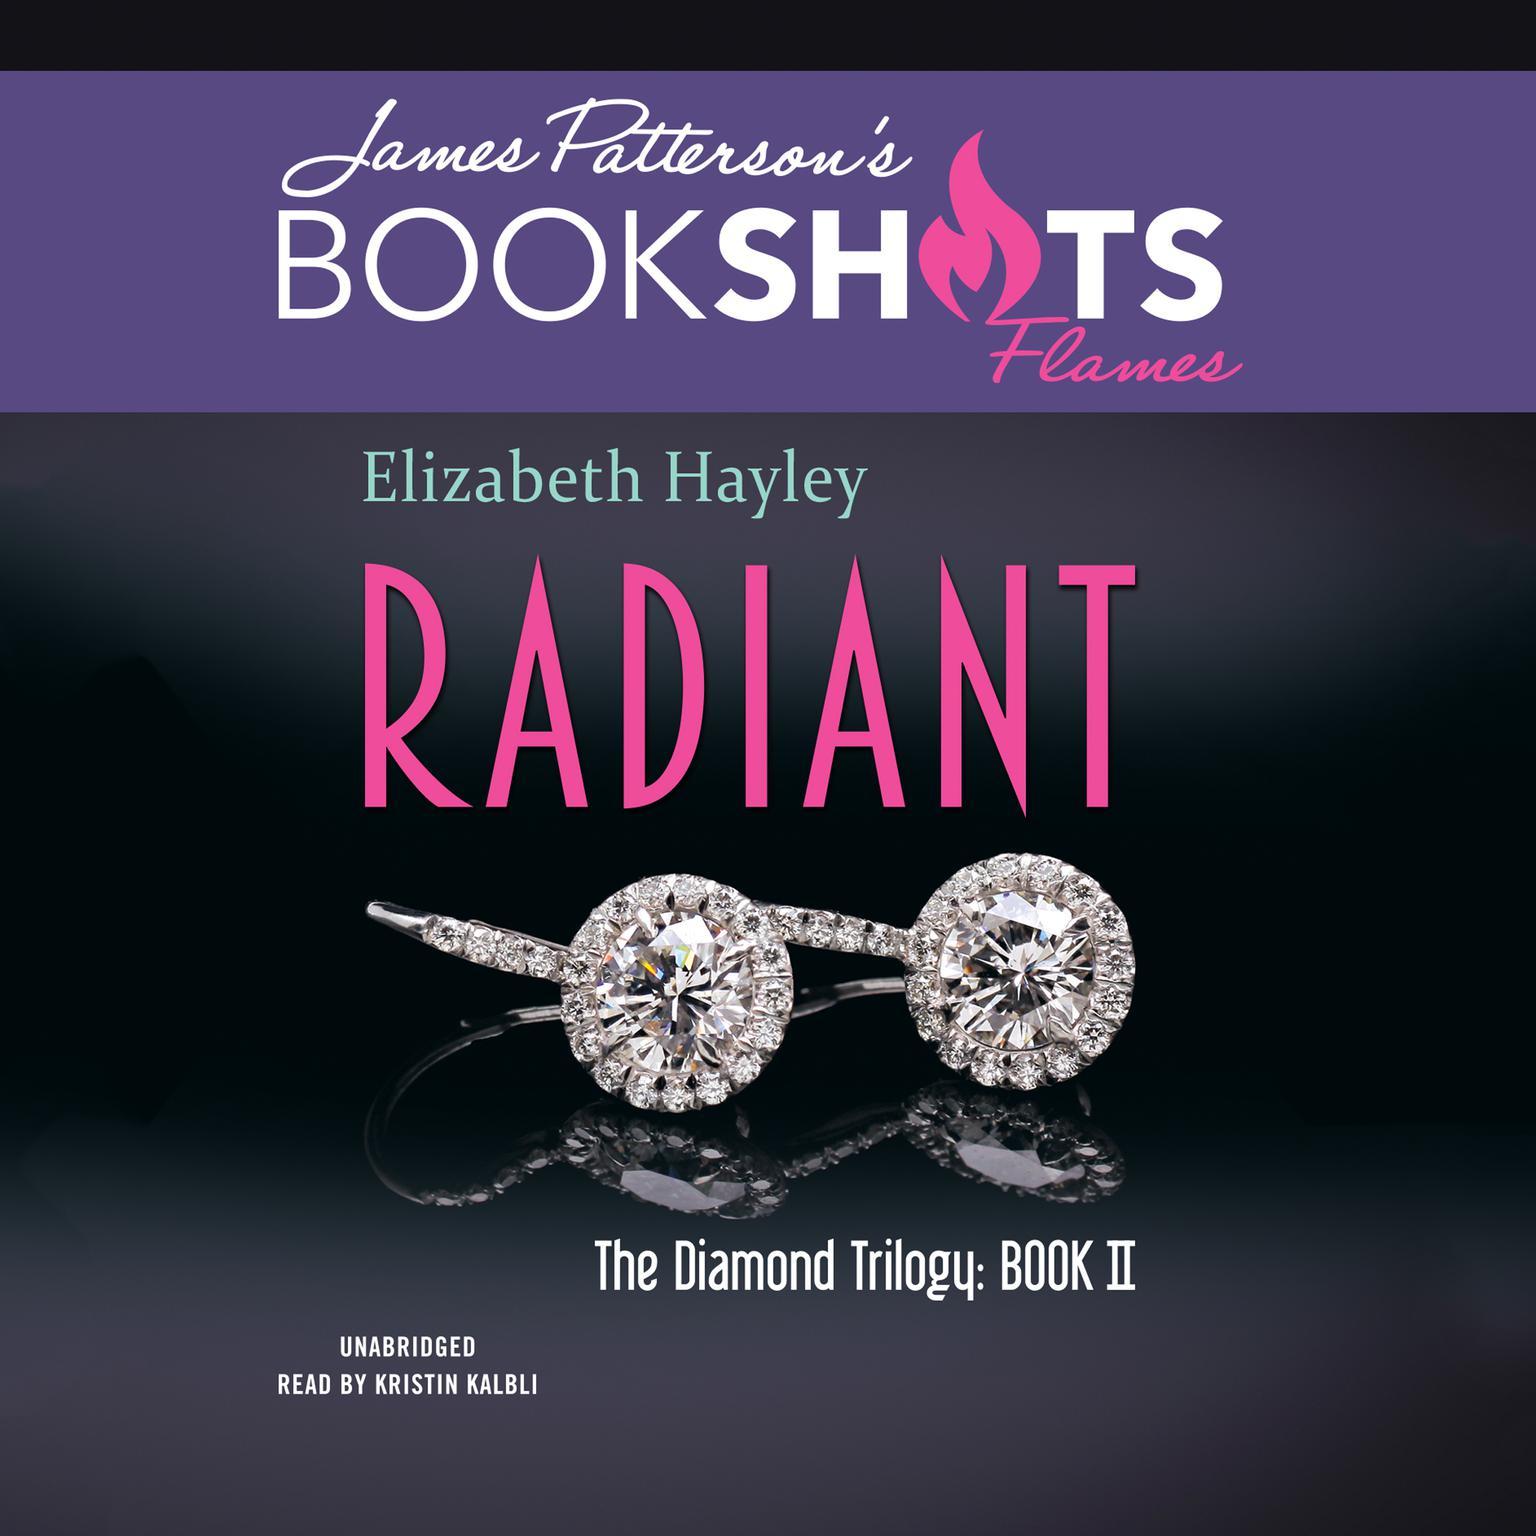 Radiant: The Diamond Trilogy, Book II Audiobook, by Elizabeth Hayley